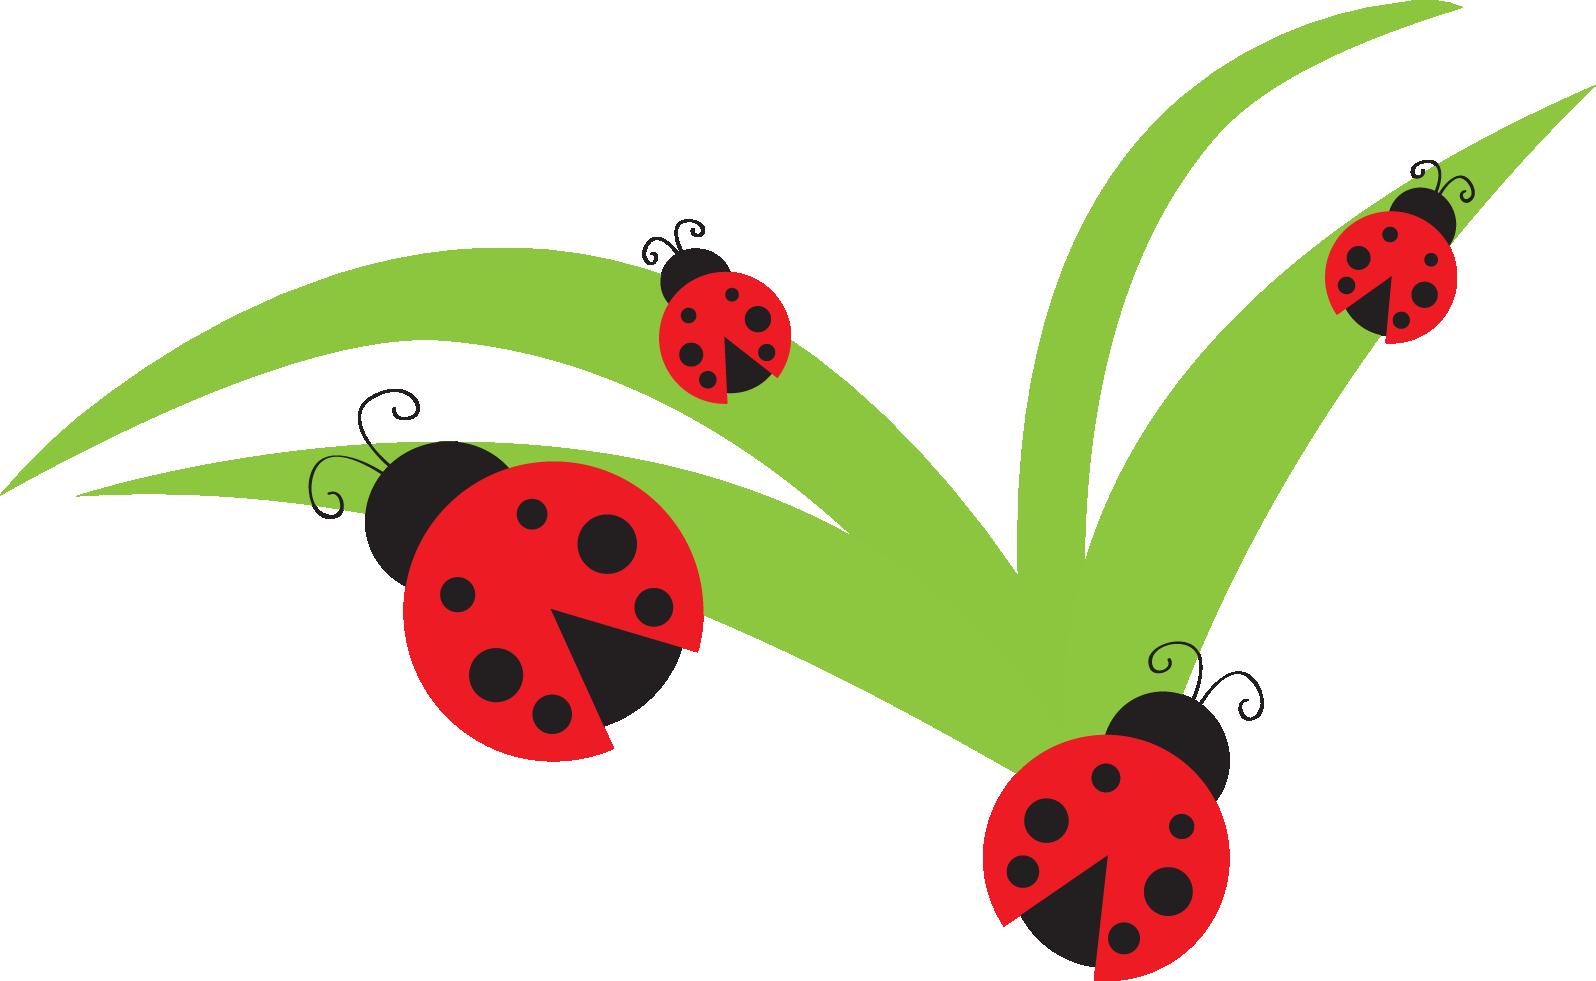 Ladybug clip art images